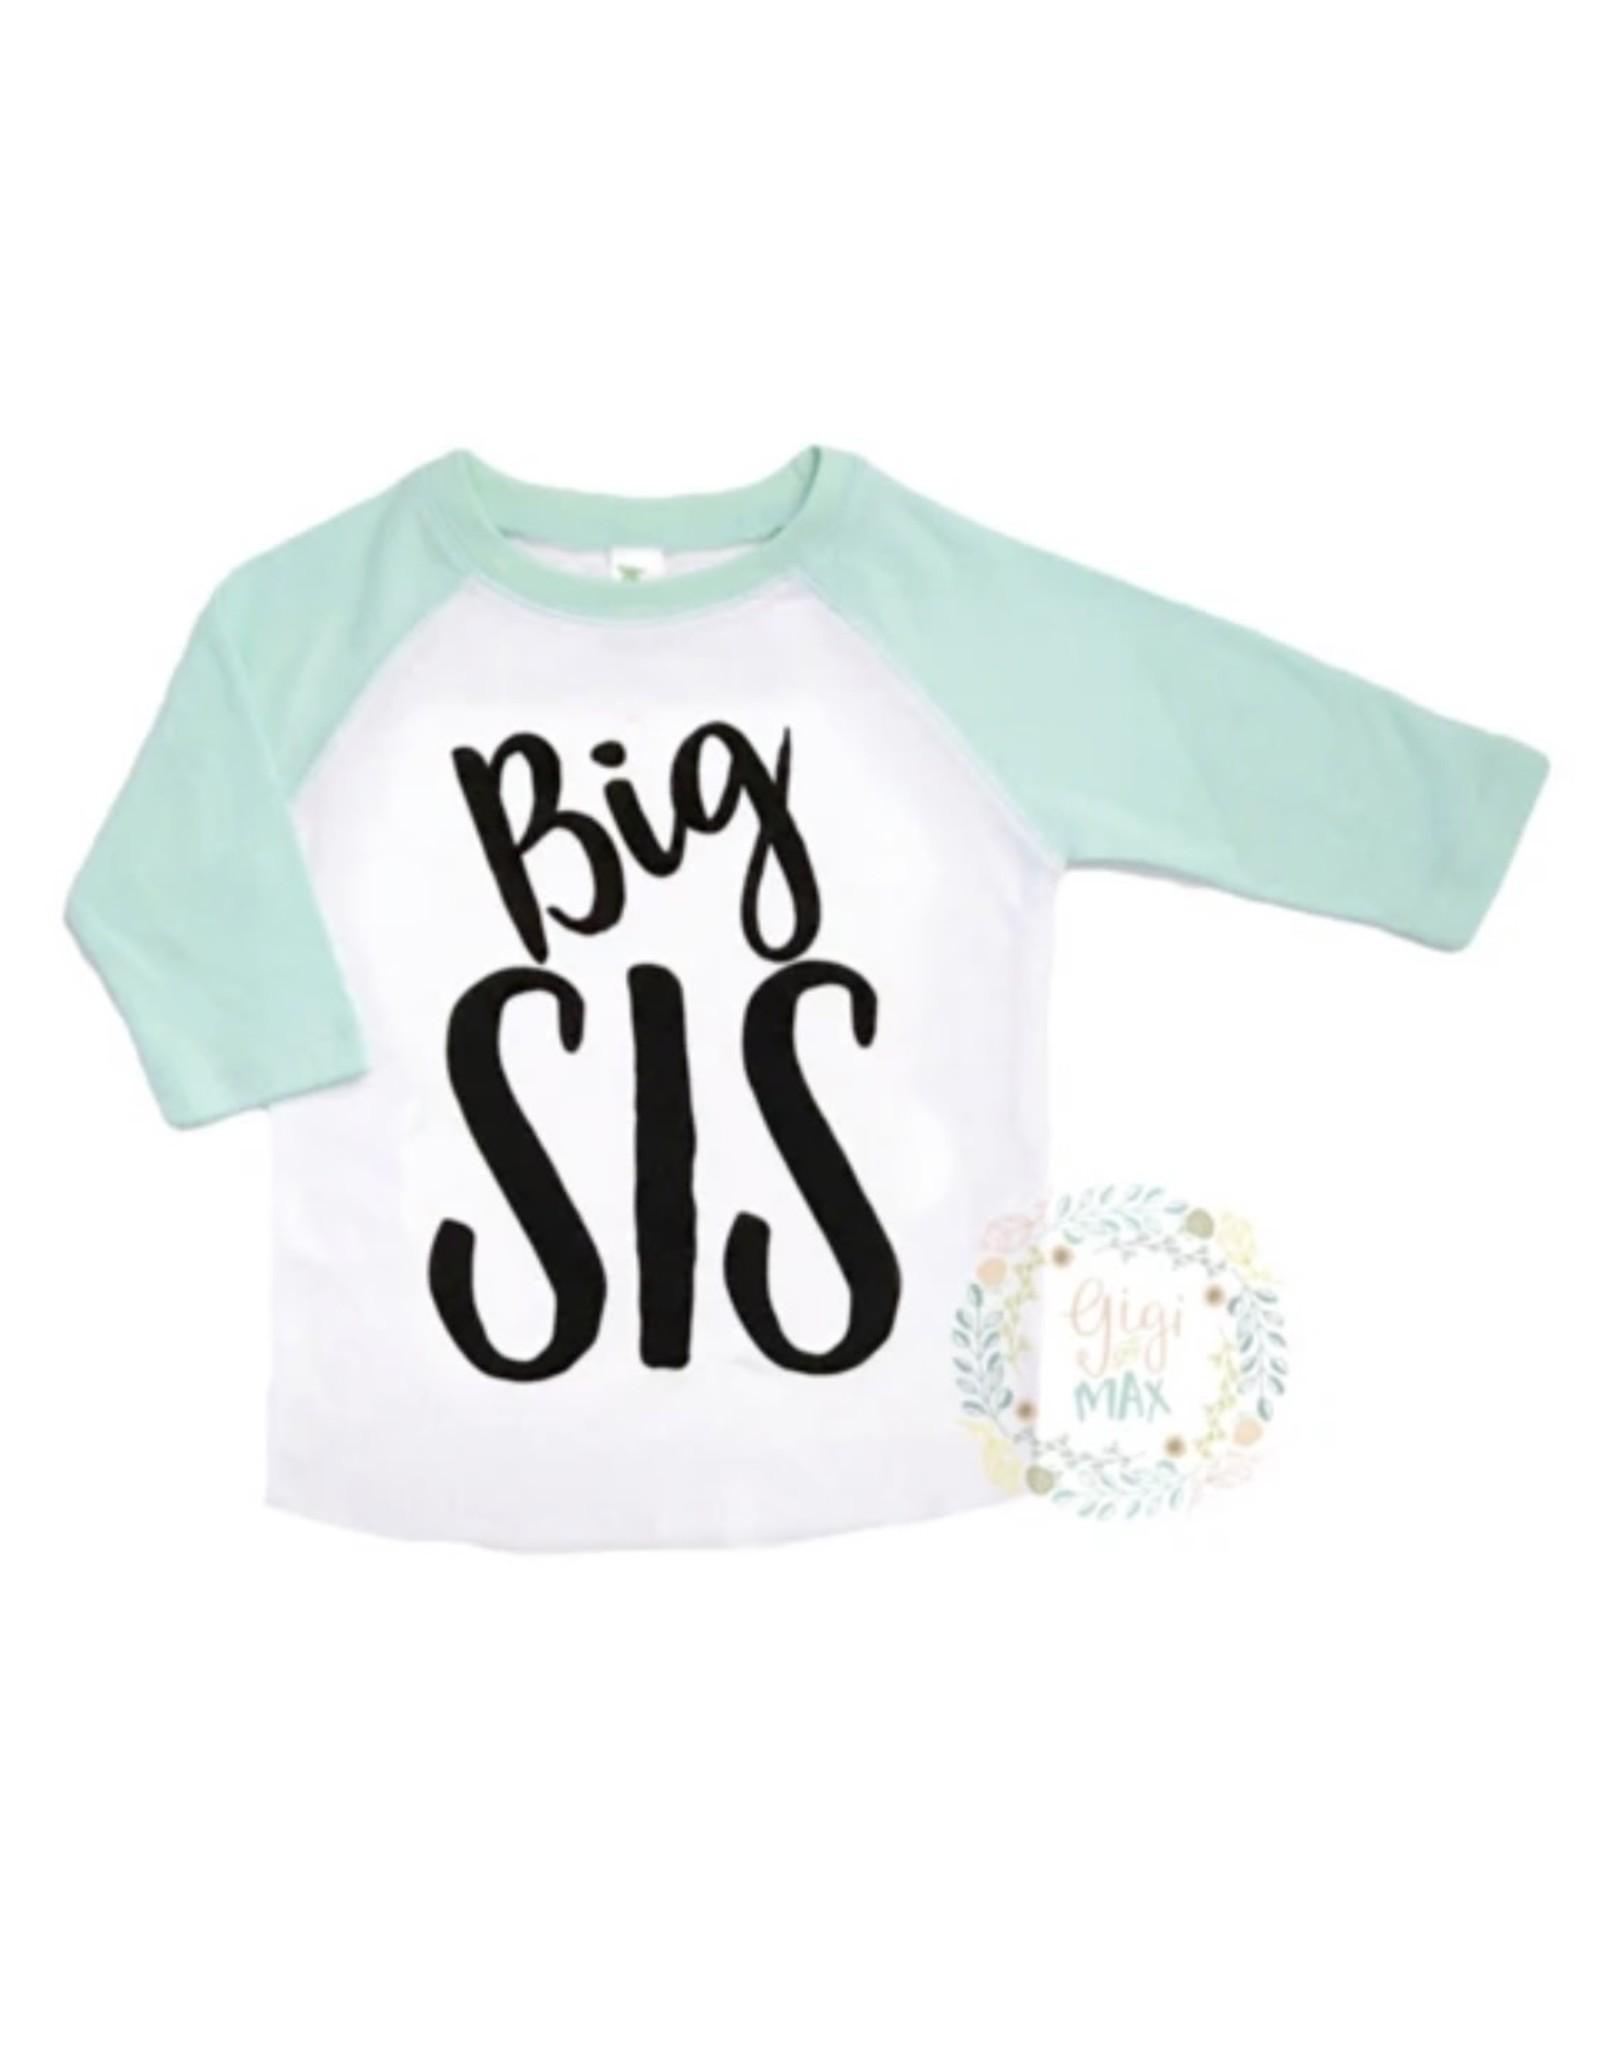 Gigi & Max Gigi & Max - Big Sis Mint Sleeve Raglan